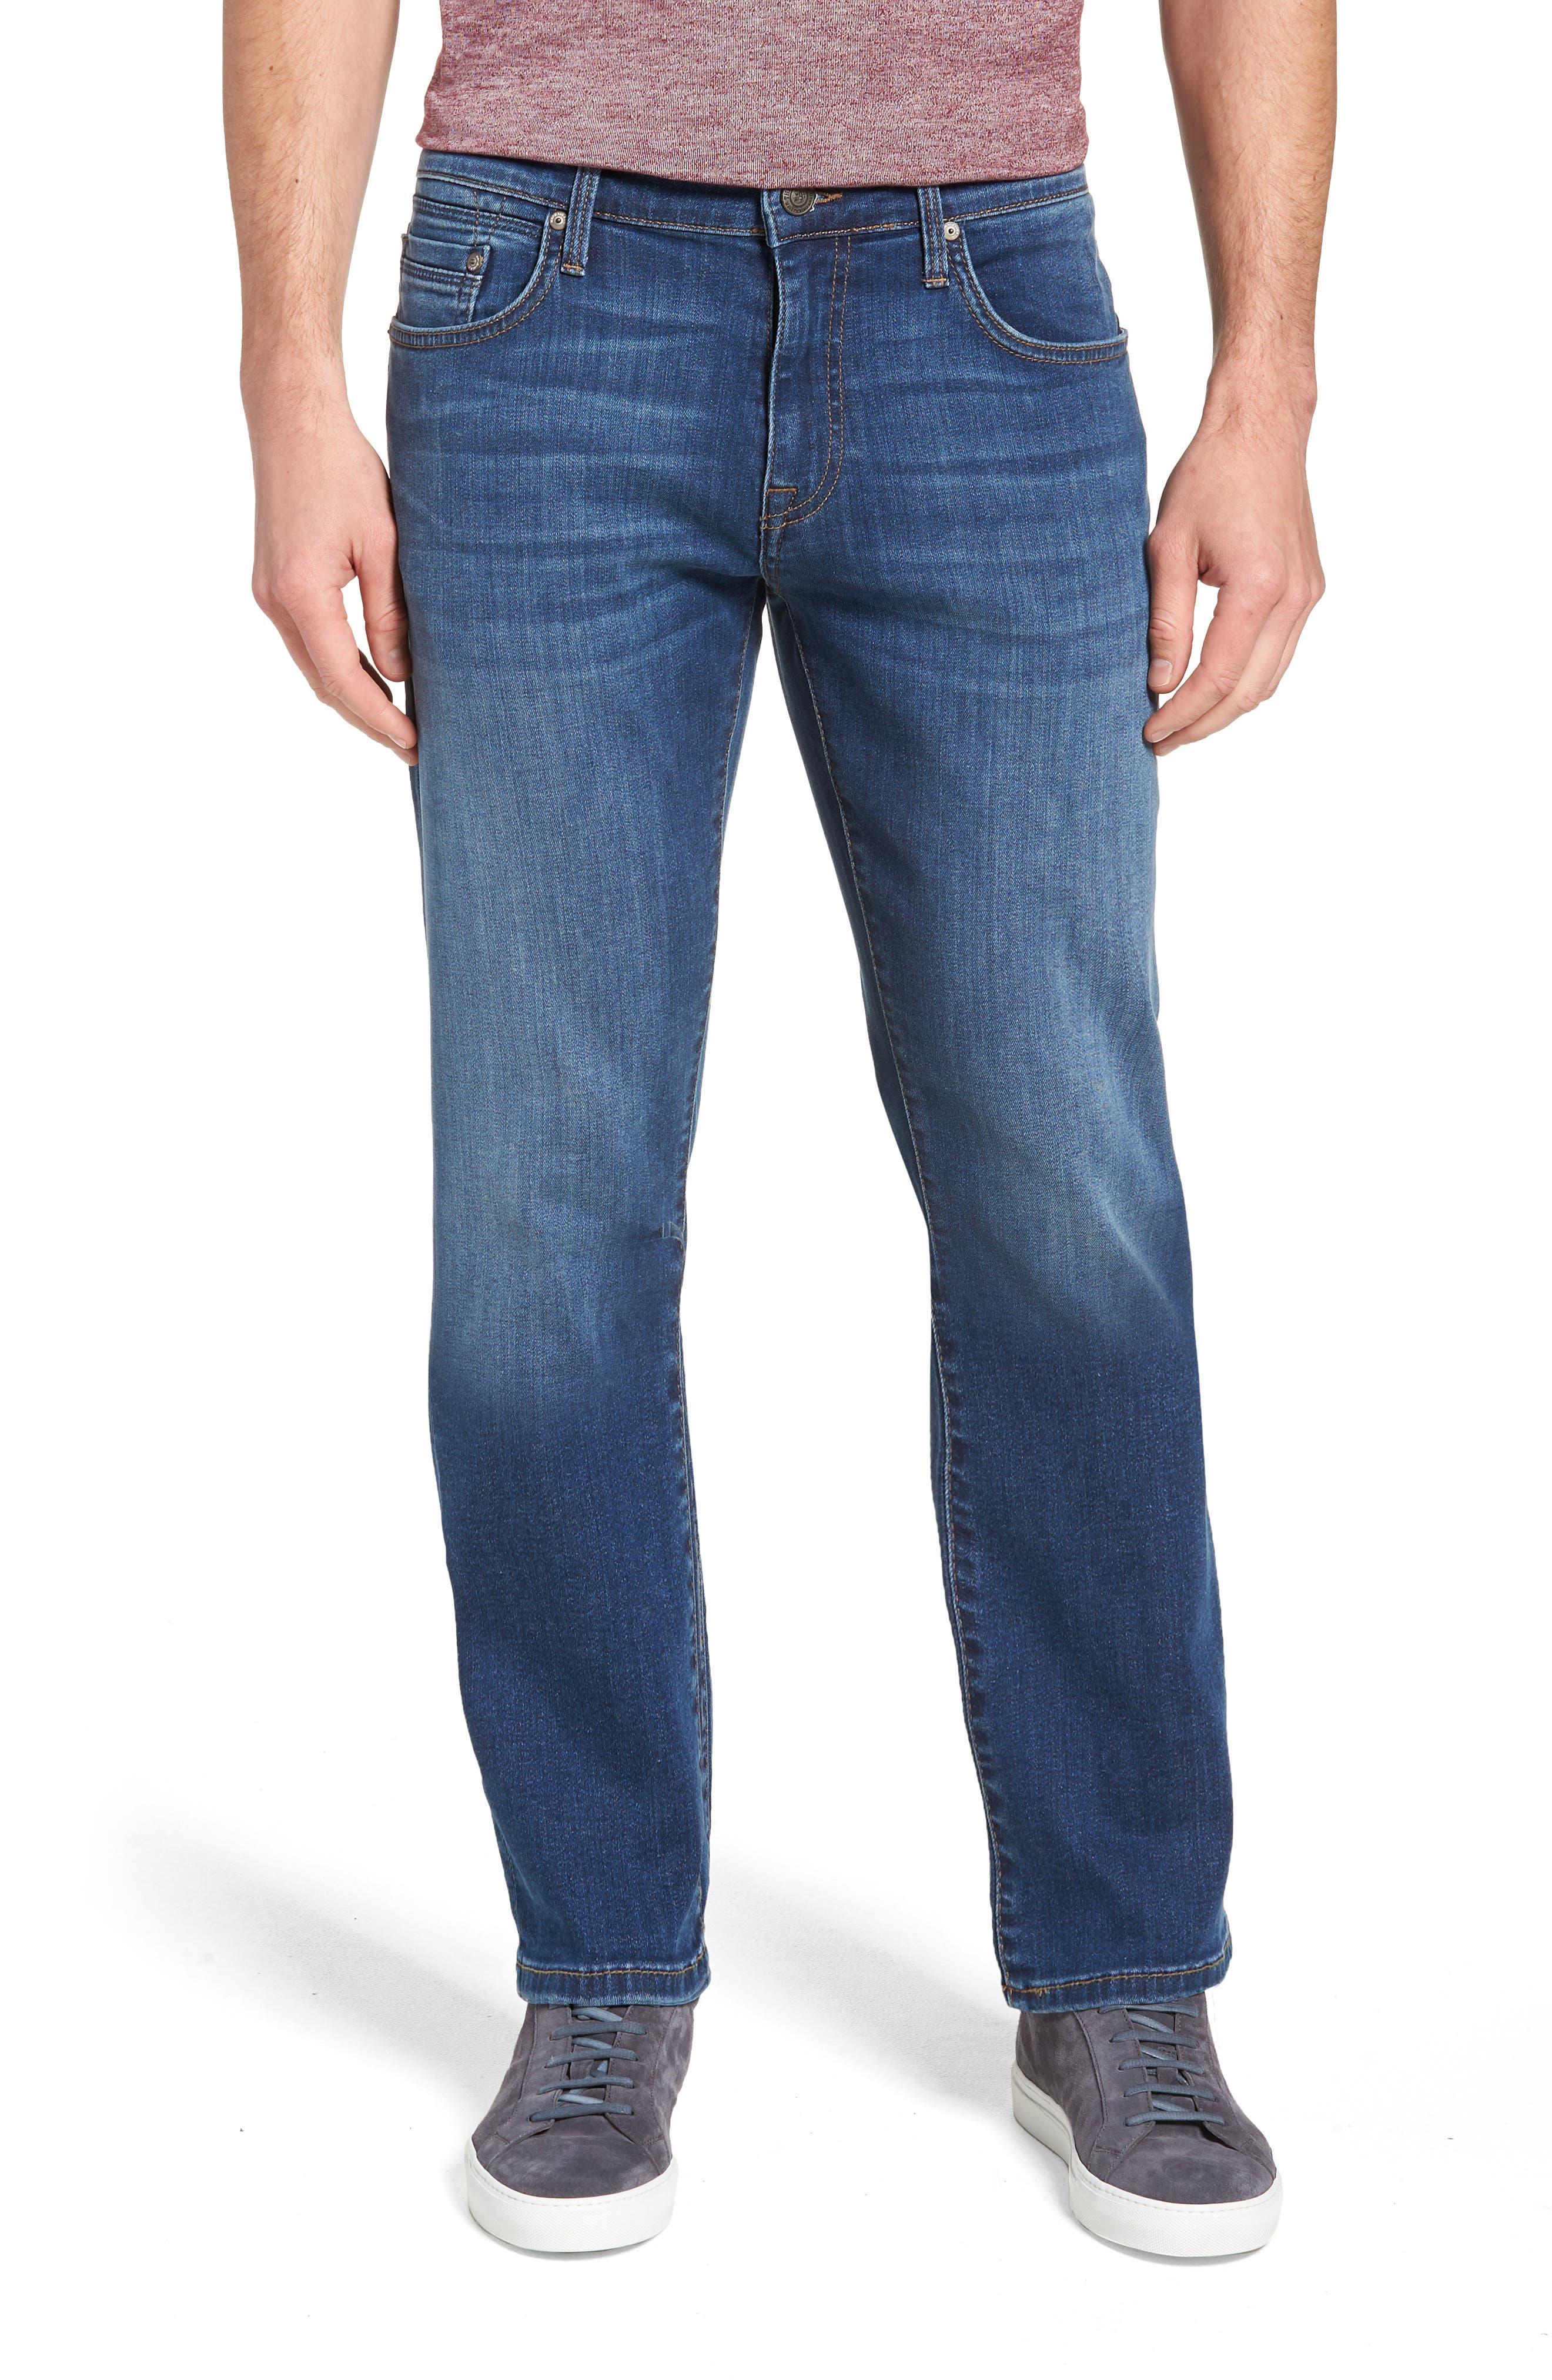 MAVI JEANS, Zach Straight Leg Jeans, Main thumbnail 1, color, DARK USED CAPITOL HILL